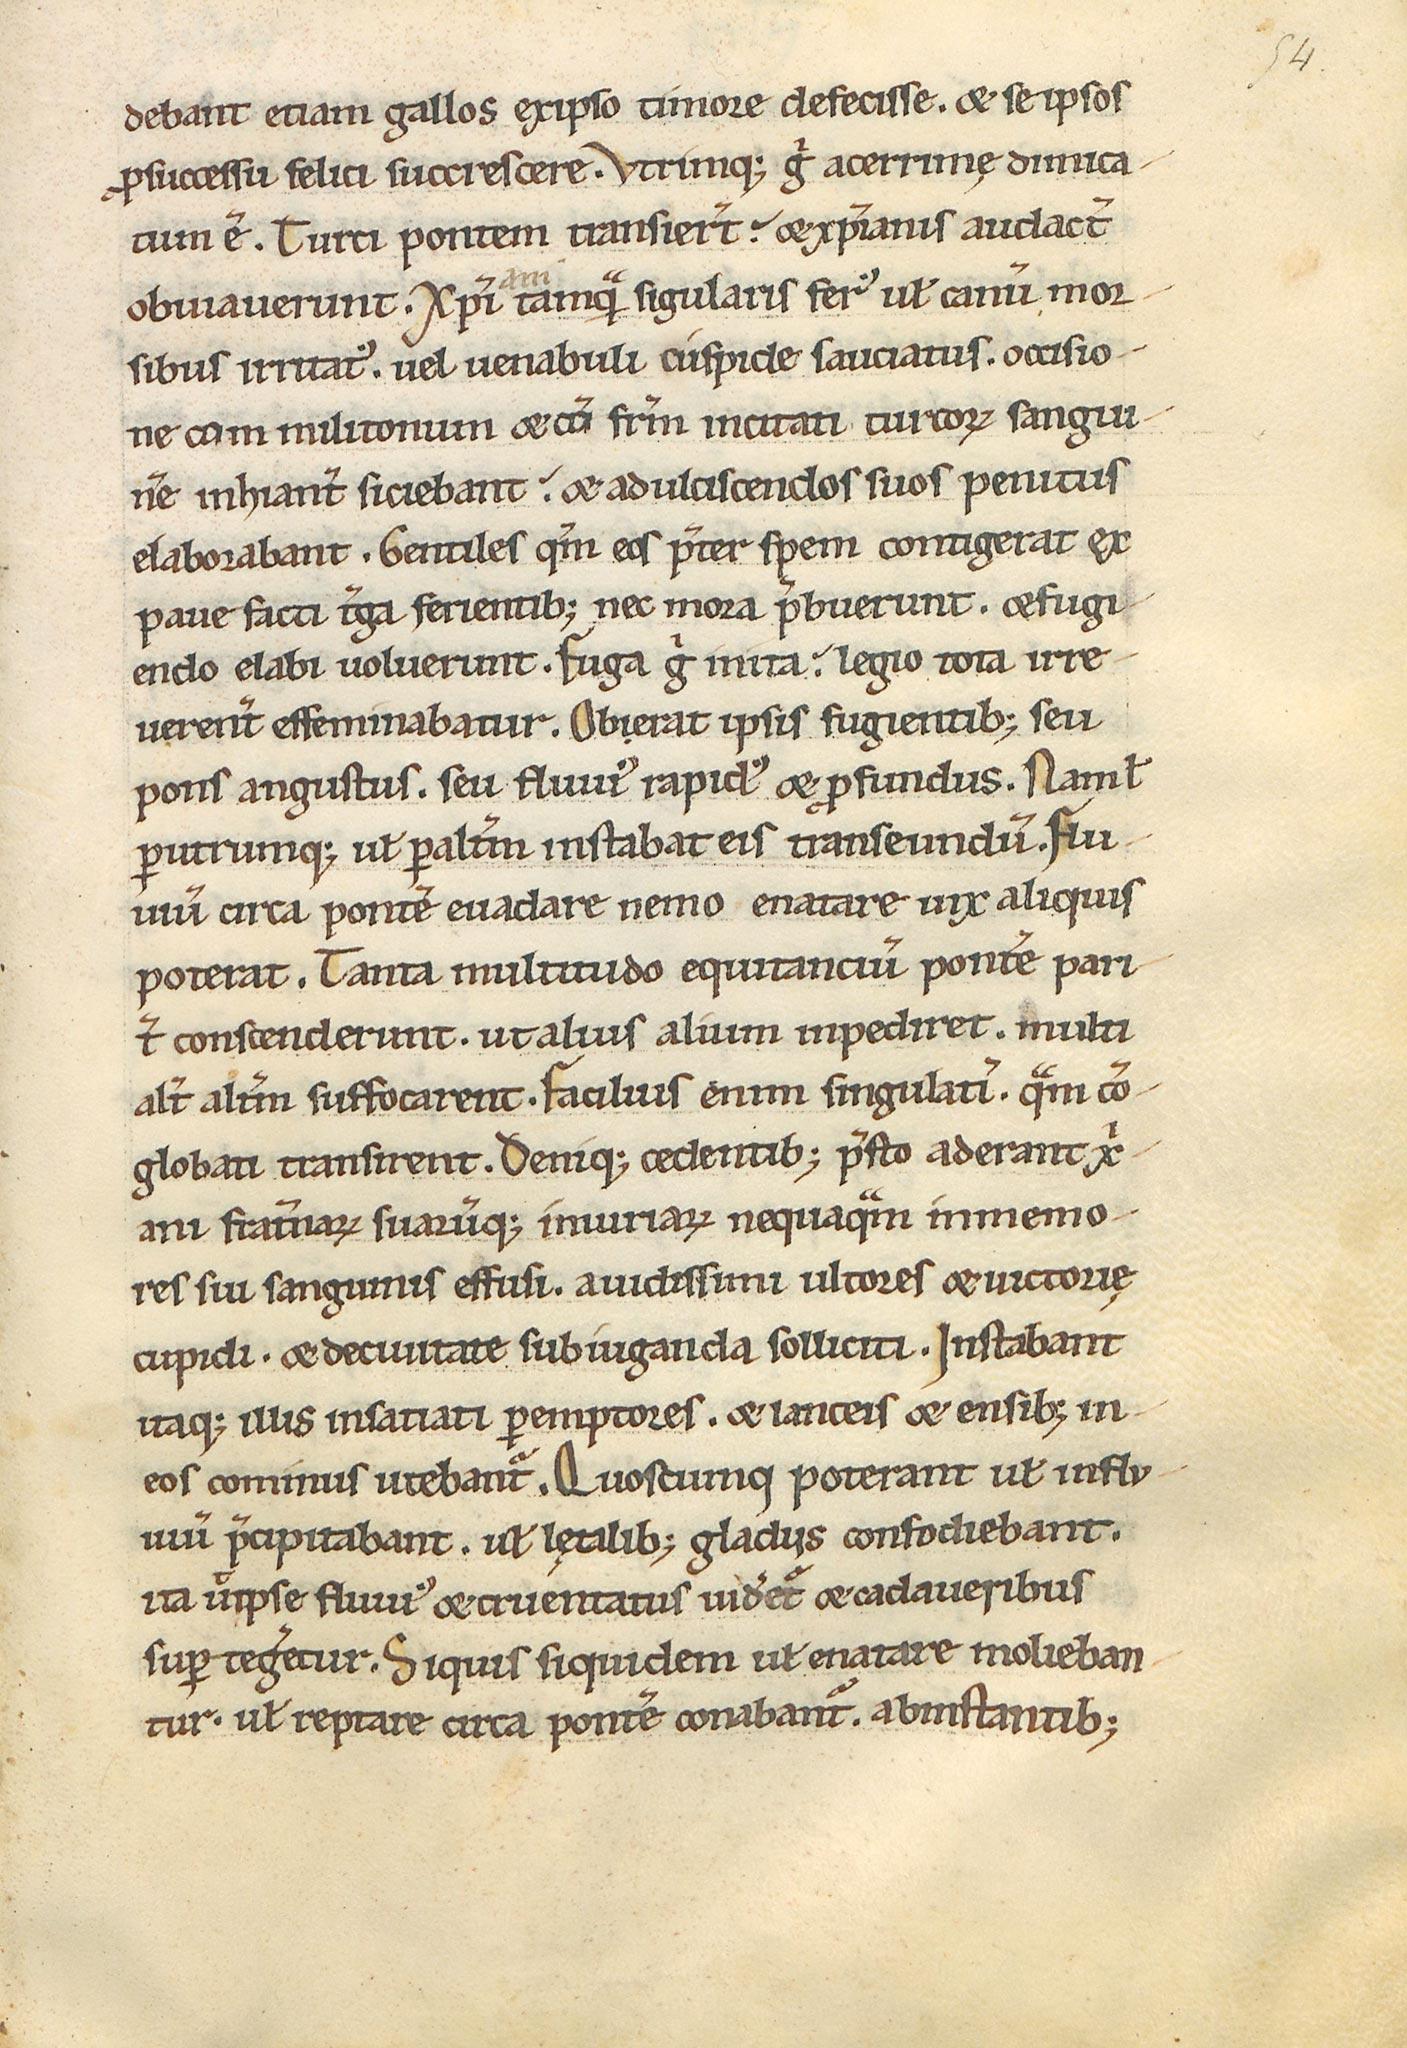 Manuscrit-Historia-Hierosolimitana-54r°